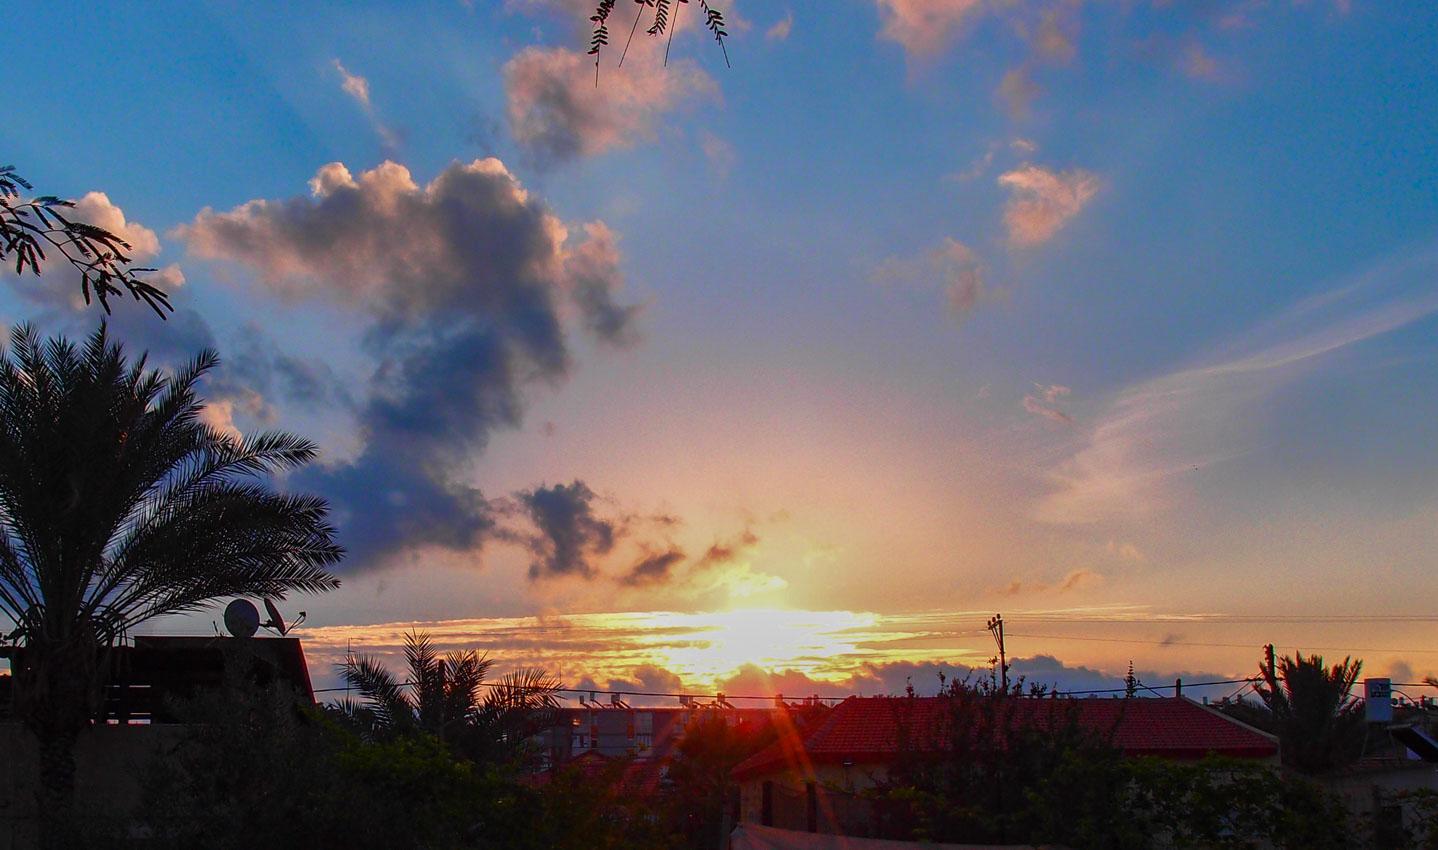 sunAstro_006.jpg